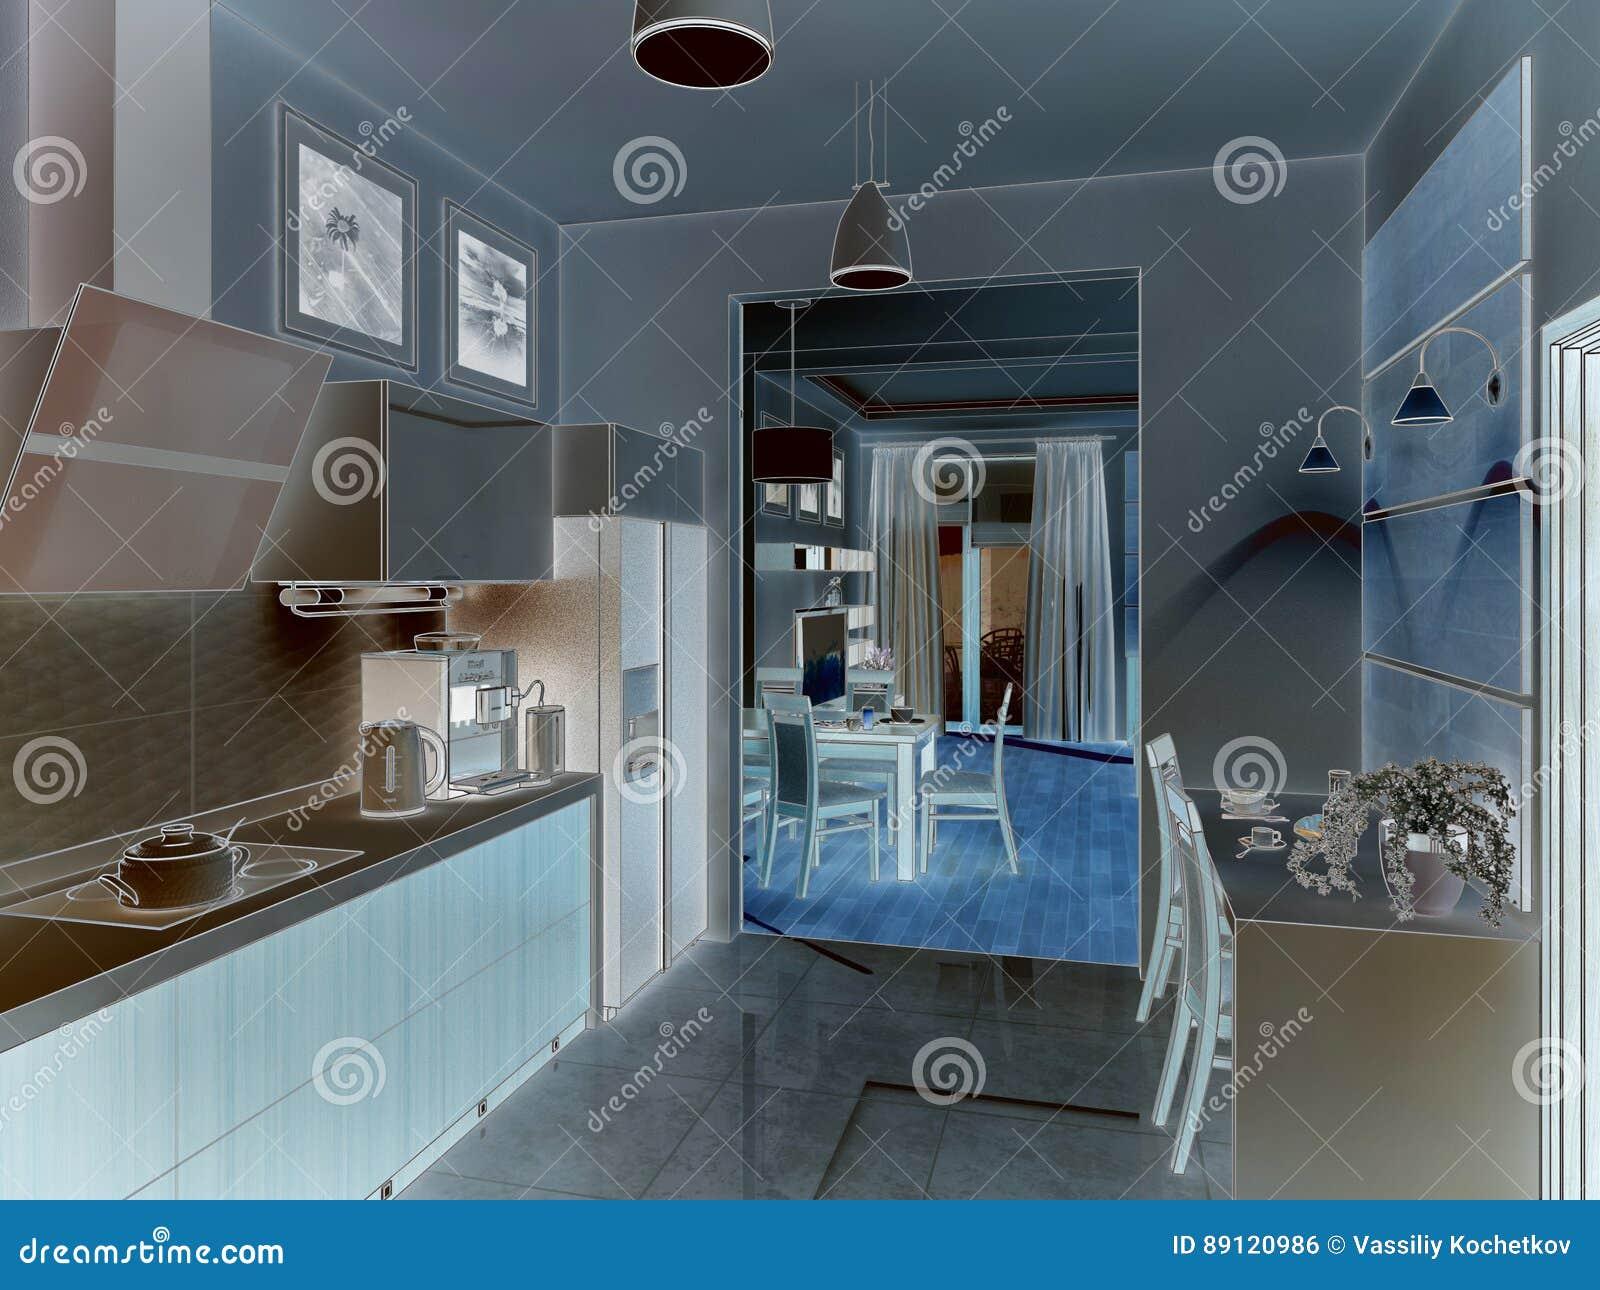 Kitchen Interior  3d Illustration, Render  Stock Photo